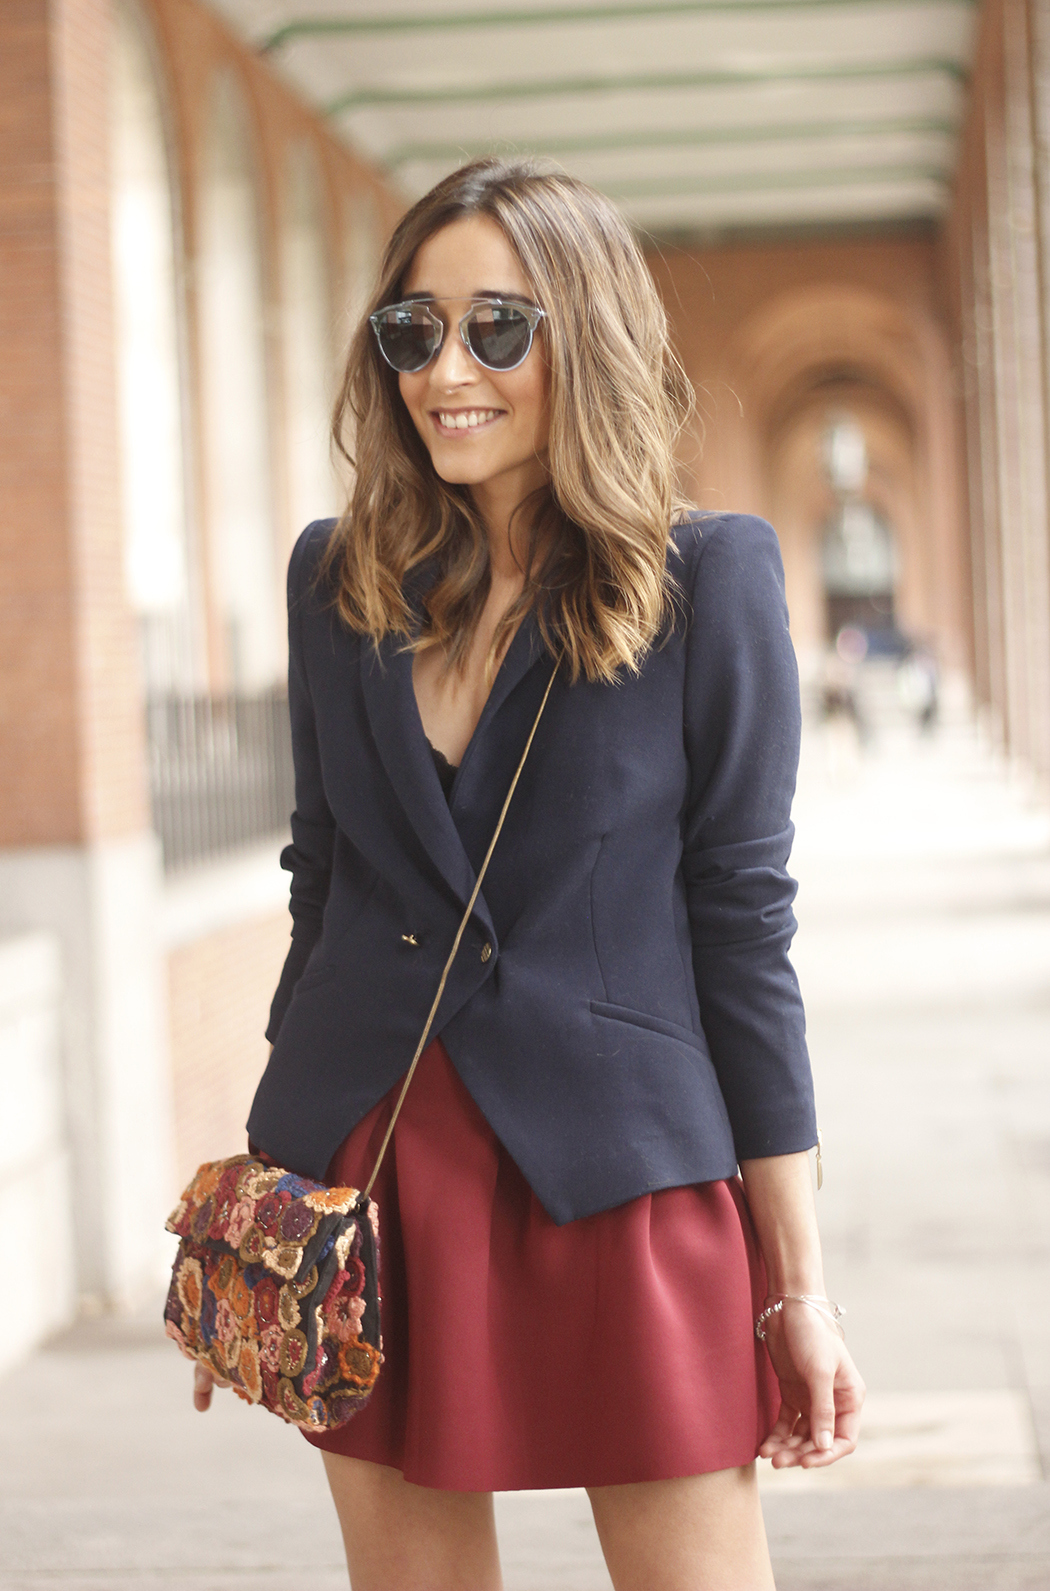 Blue Blazer Burgundy Skirt Outfit11